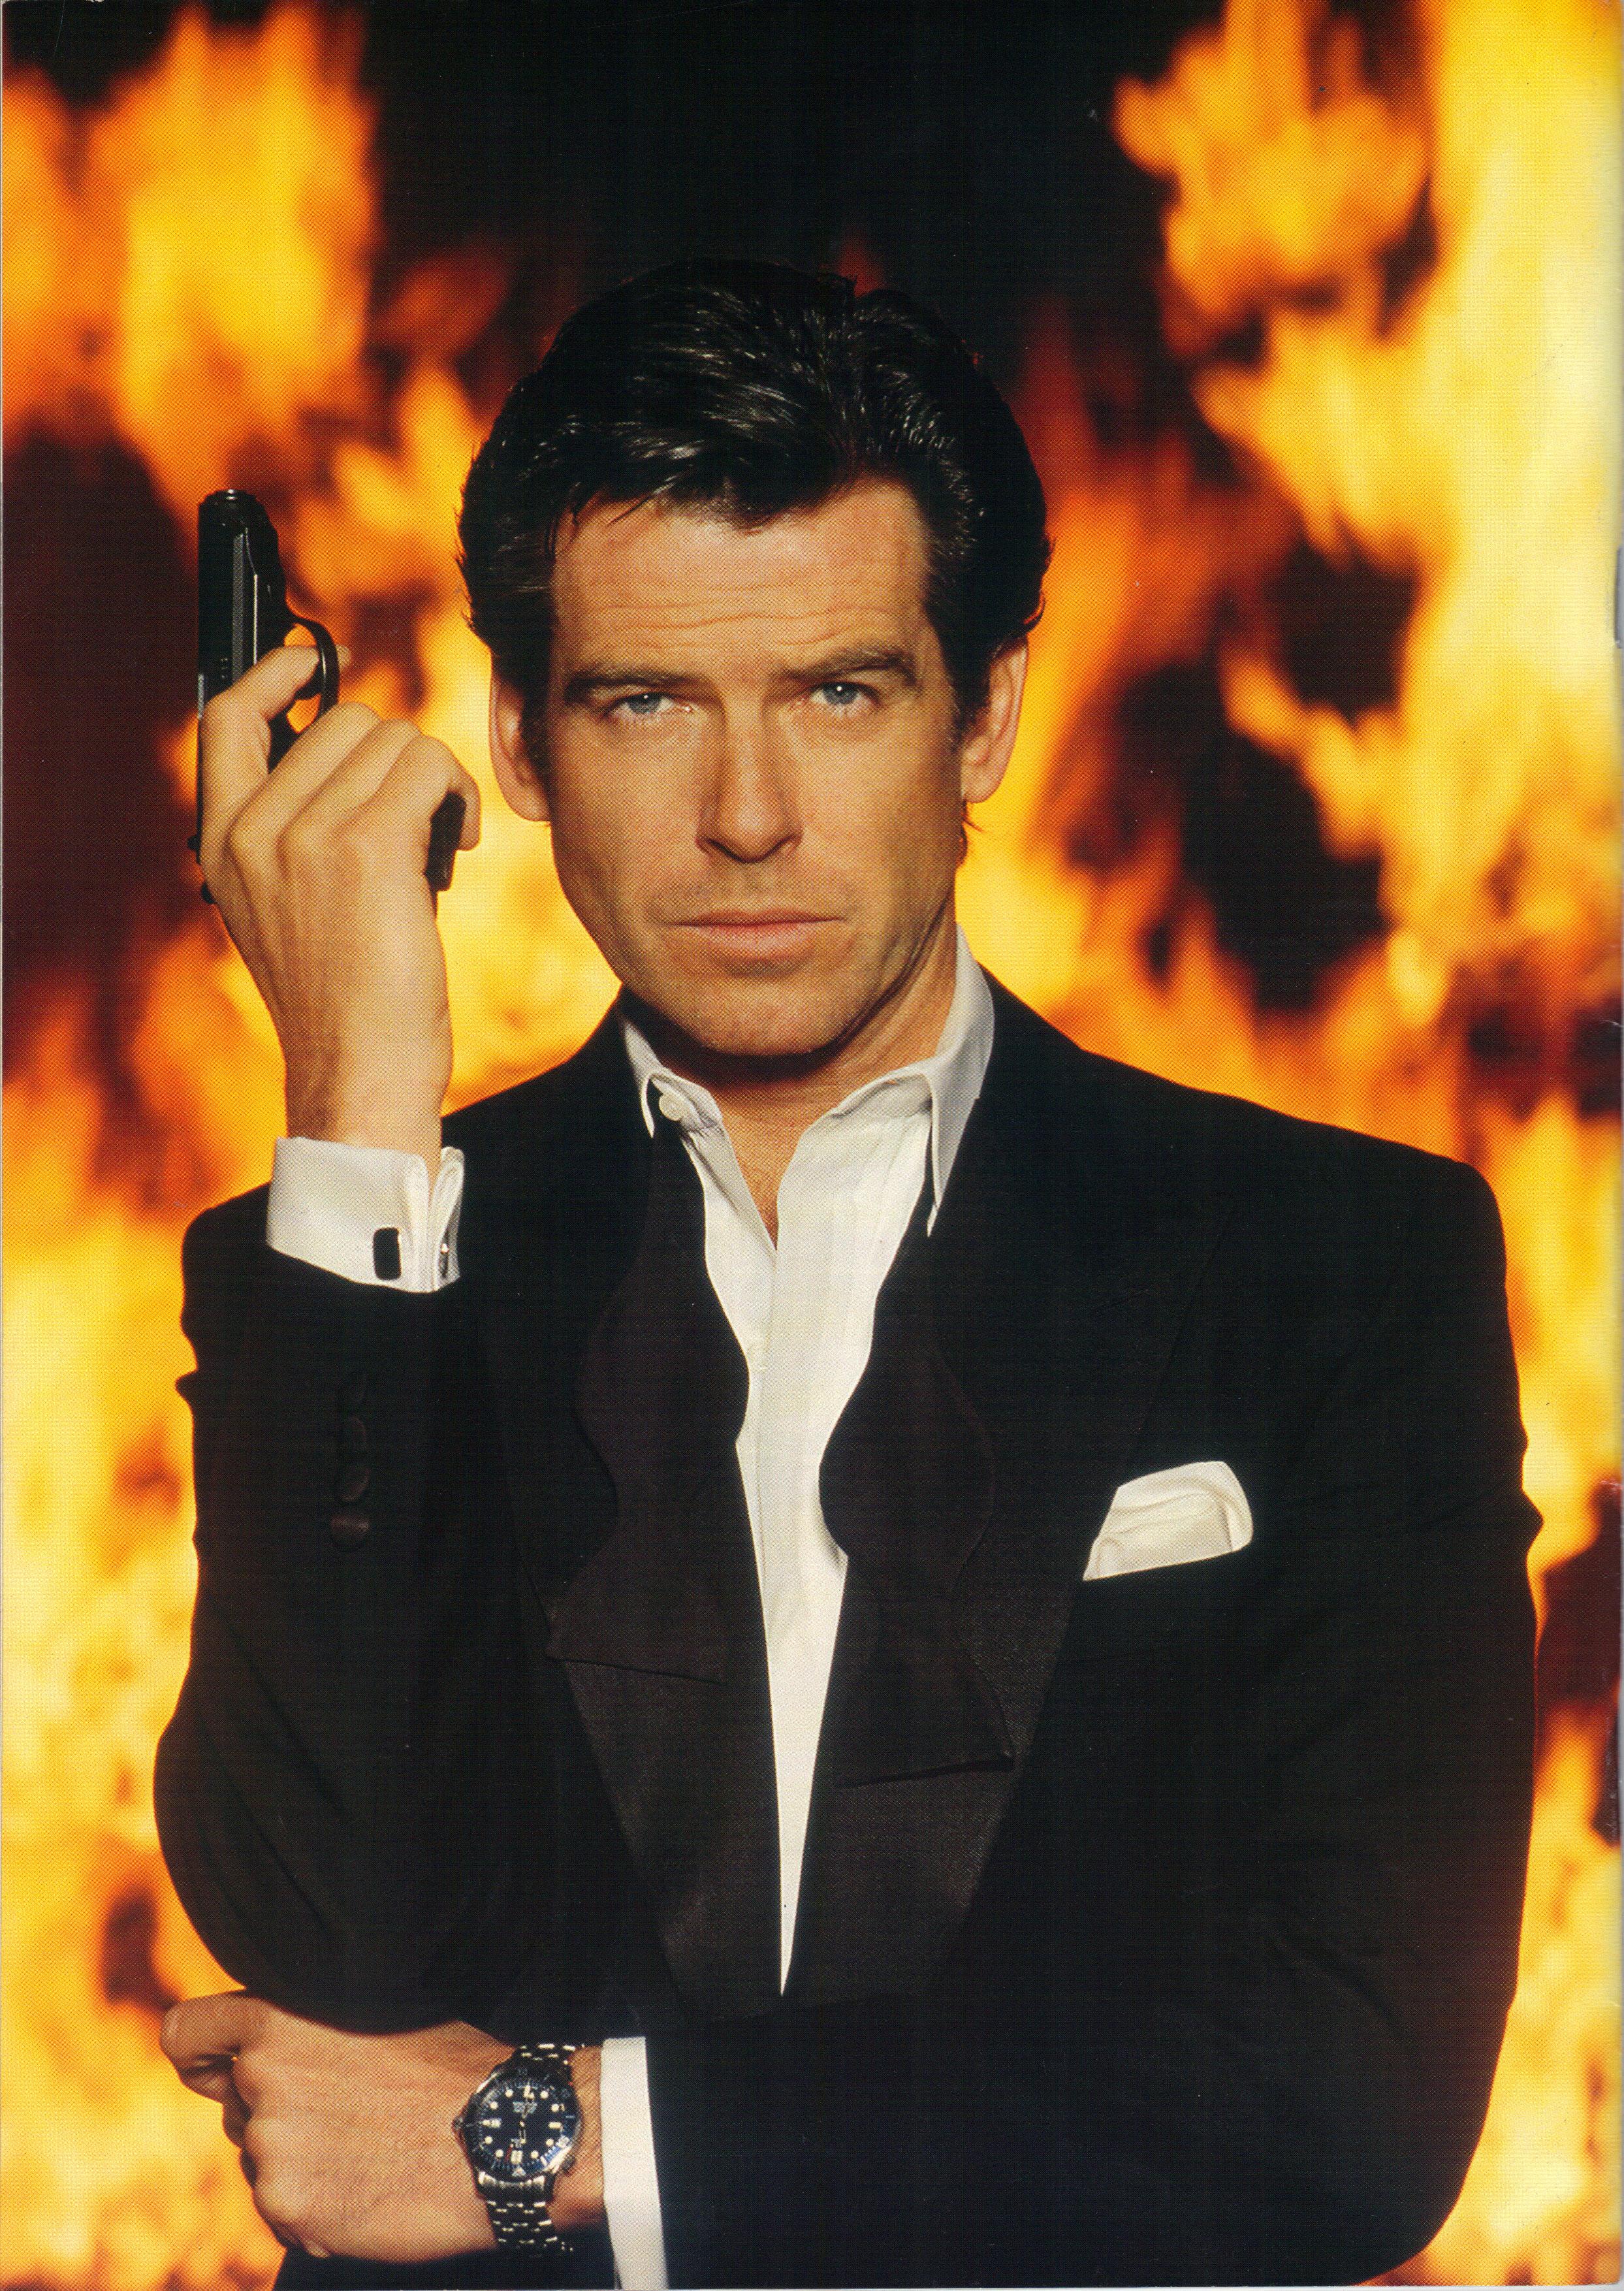 007 magazine from the james bond 007 fan club